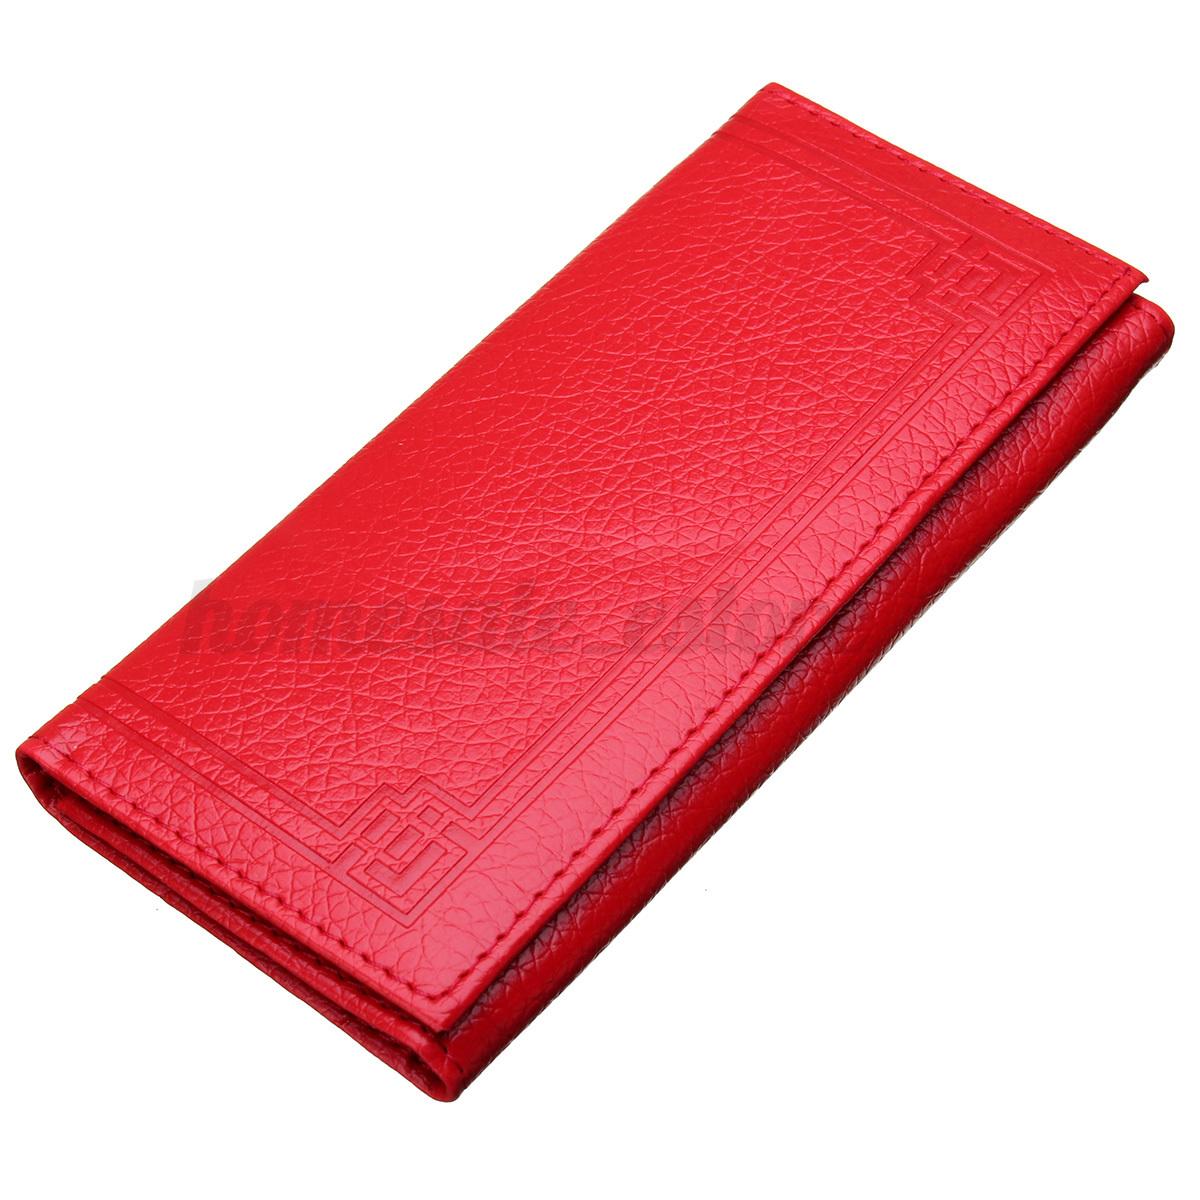 Fashion Lady Leather Clutch Wallet Long Card Holder Case Purse Women Handbag HOT